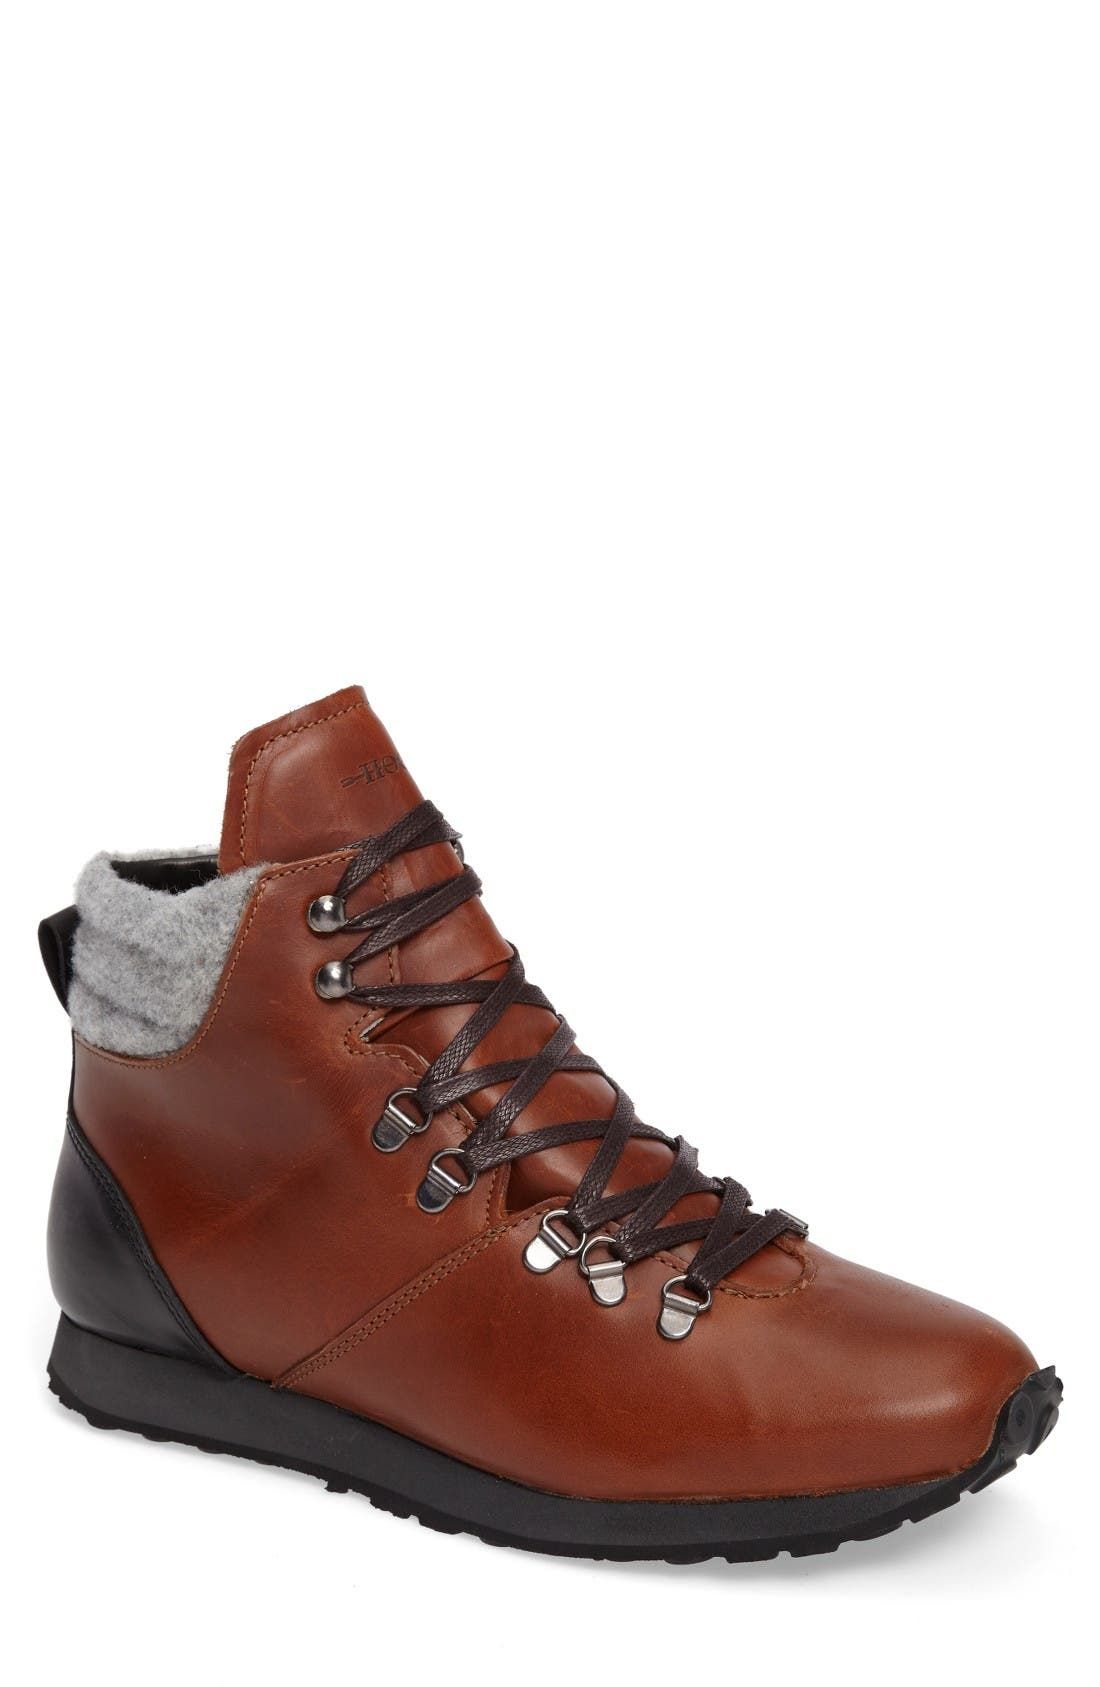 Hood Rubber Concord Mid Top Wool Cuffed Waterproof Boot (Men)